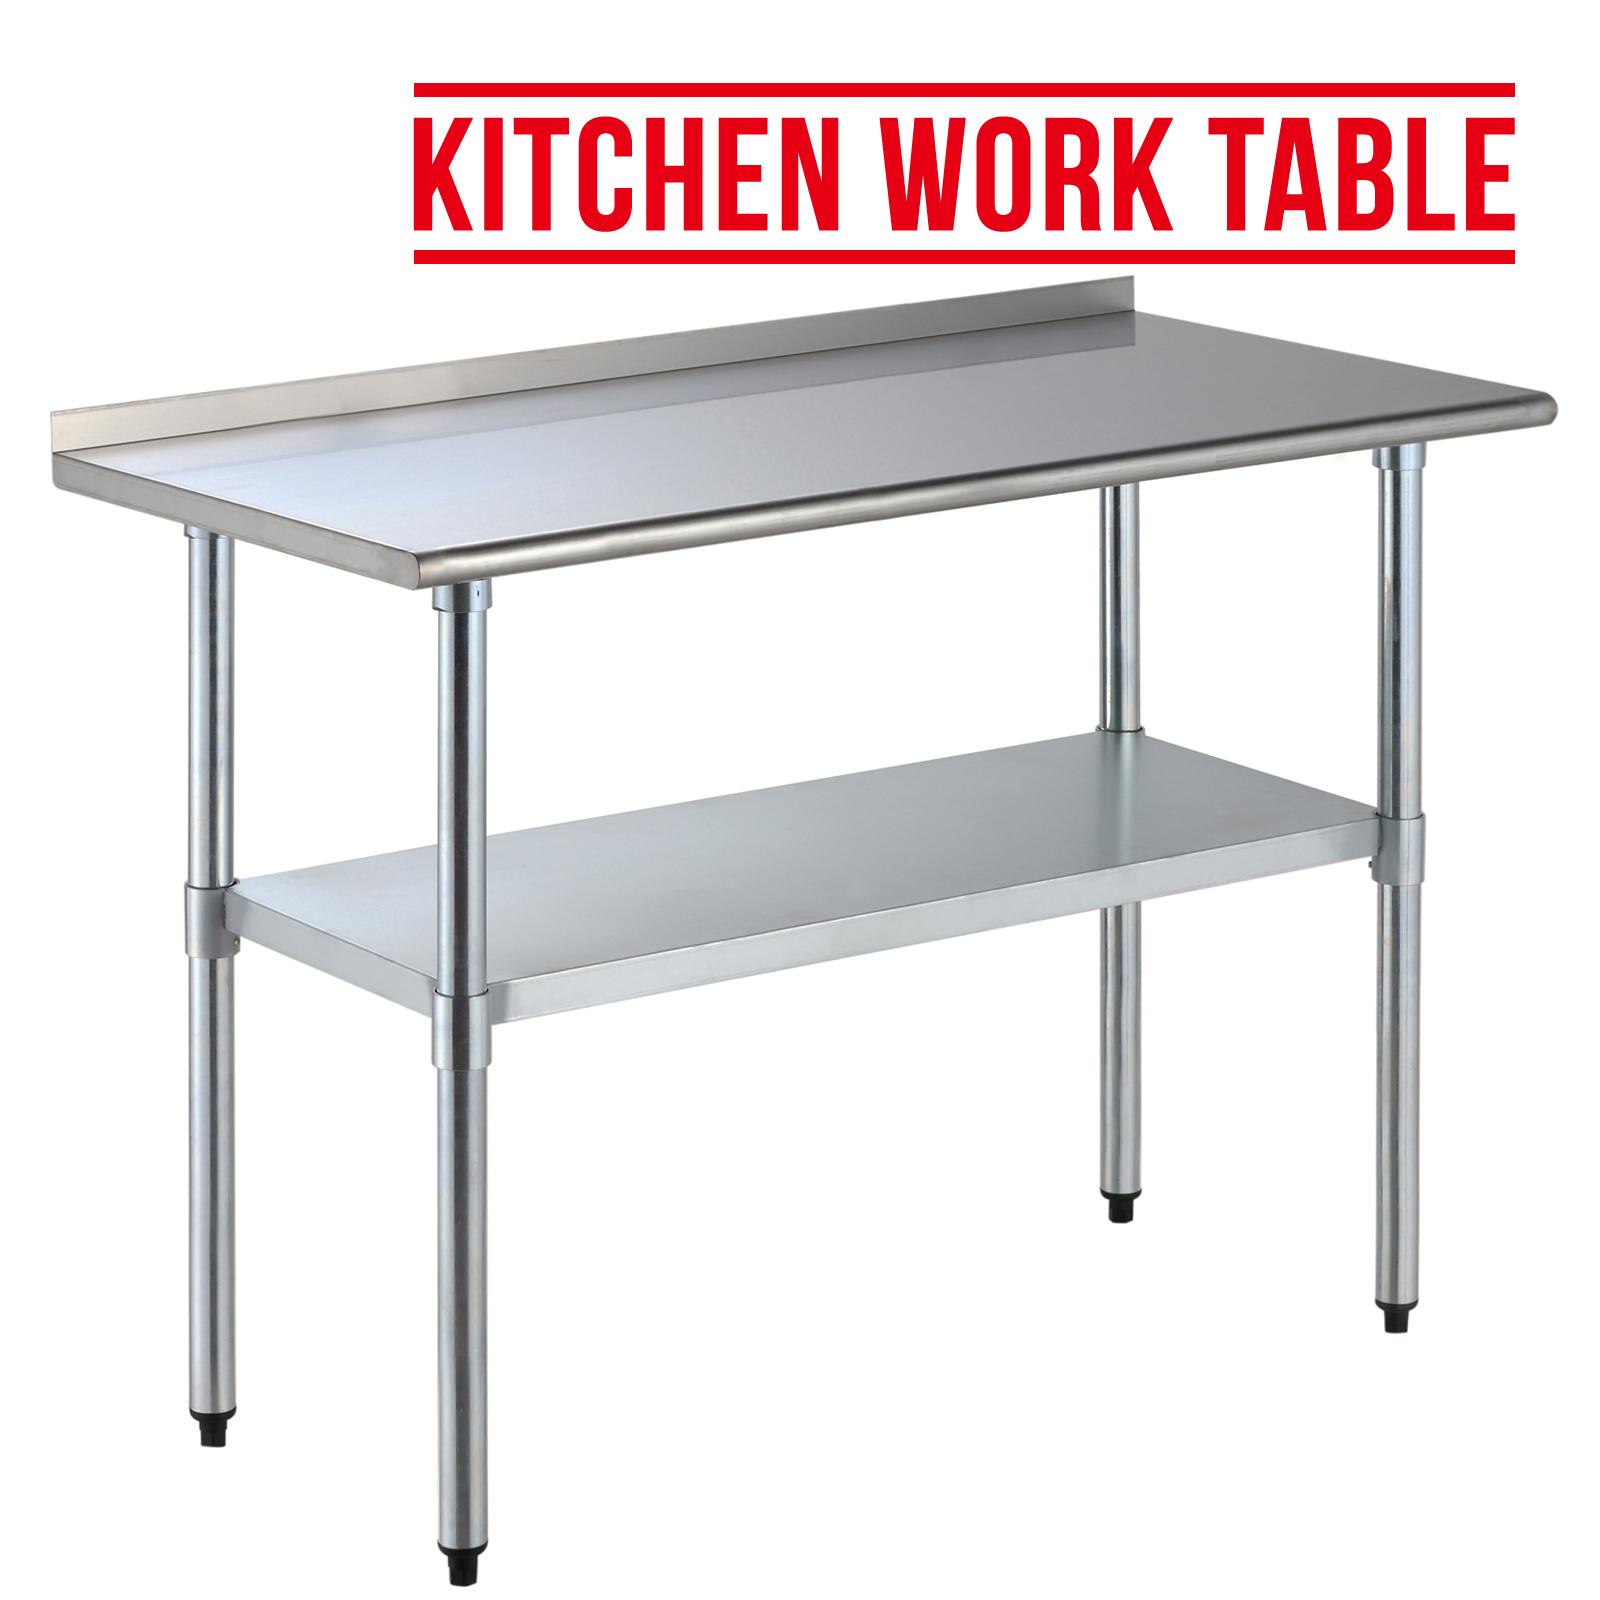 stainless steel kitchen restaurant work prep table w backsplash ebay